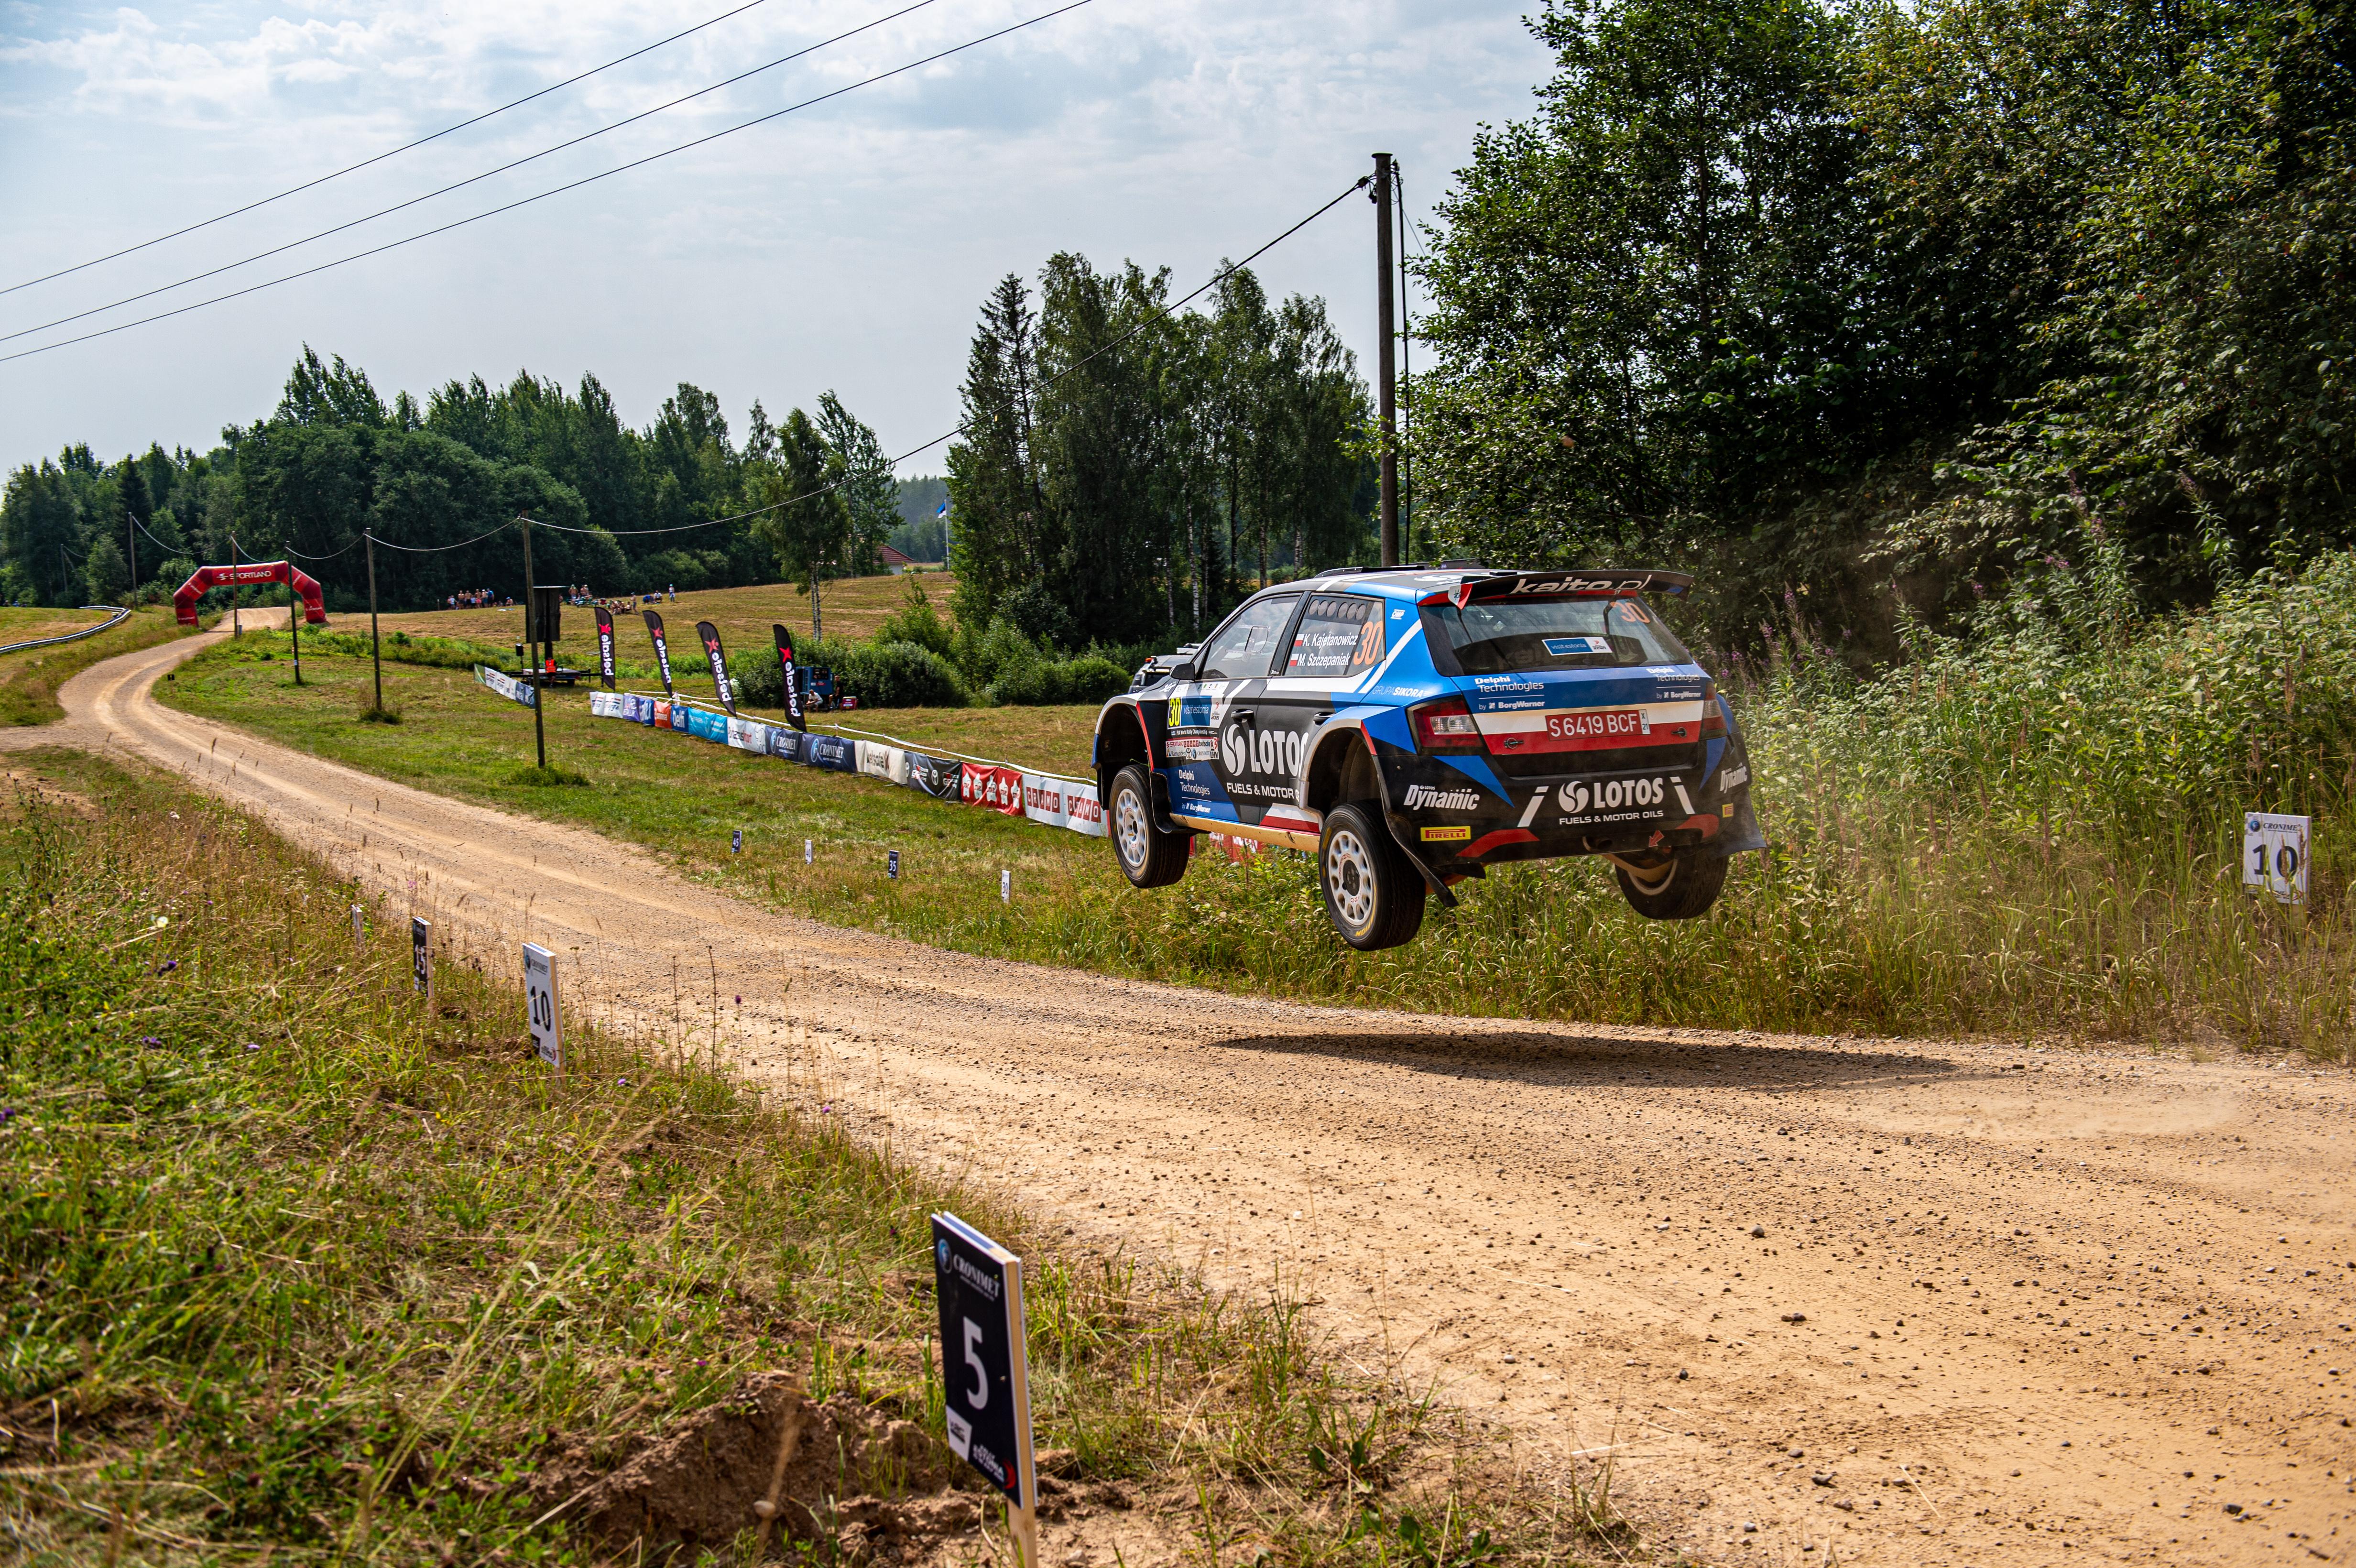 SKODA crews win WRC2 and WRC3 at Rally Estonia - Image 4